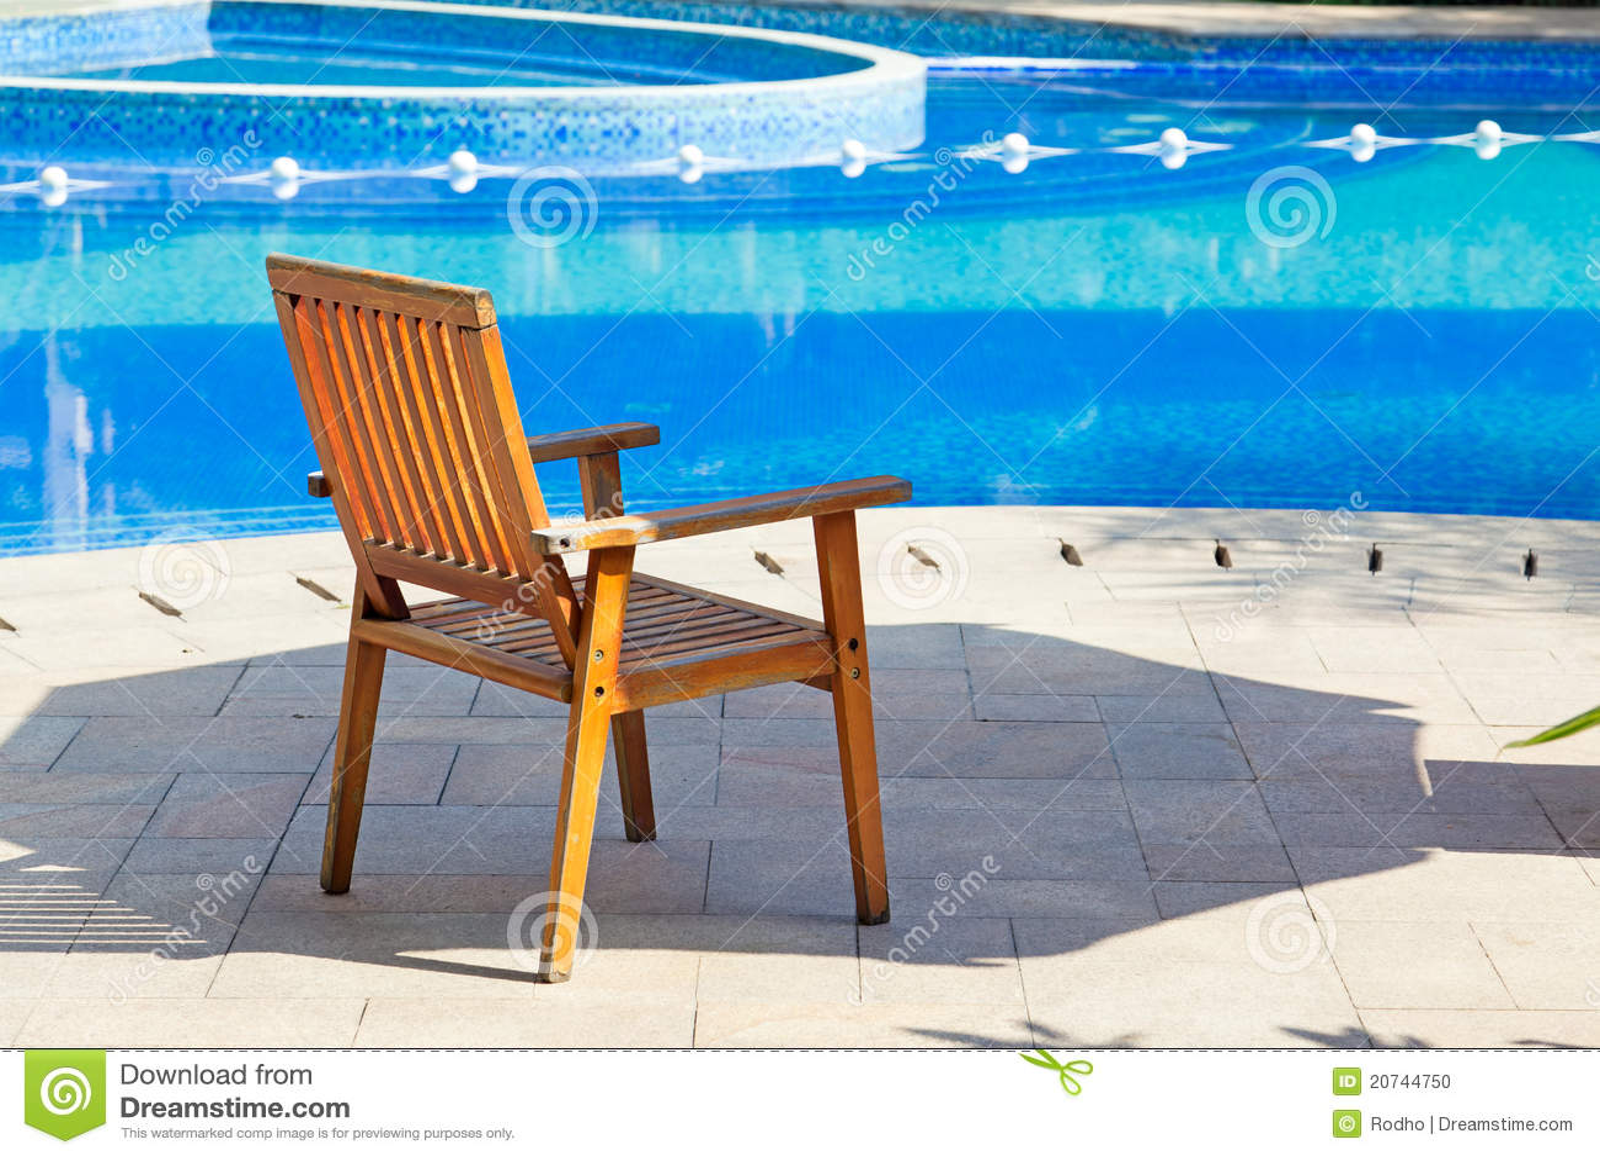 Wooden Pool Chair Stock PhotoImage 20744750